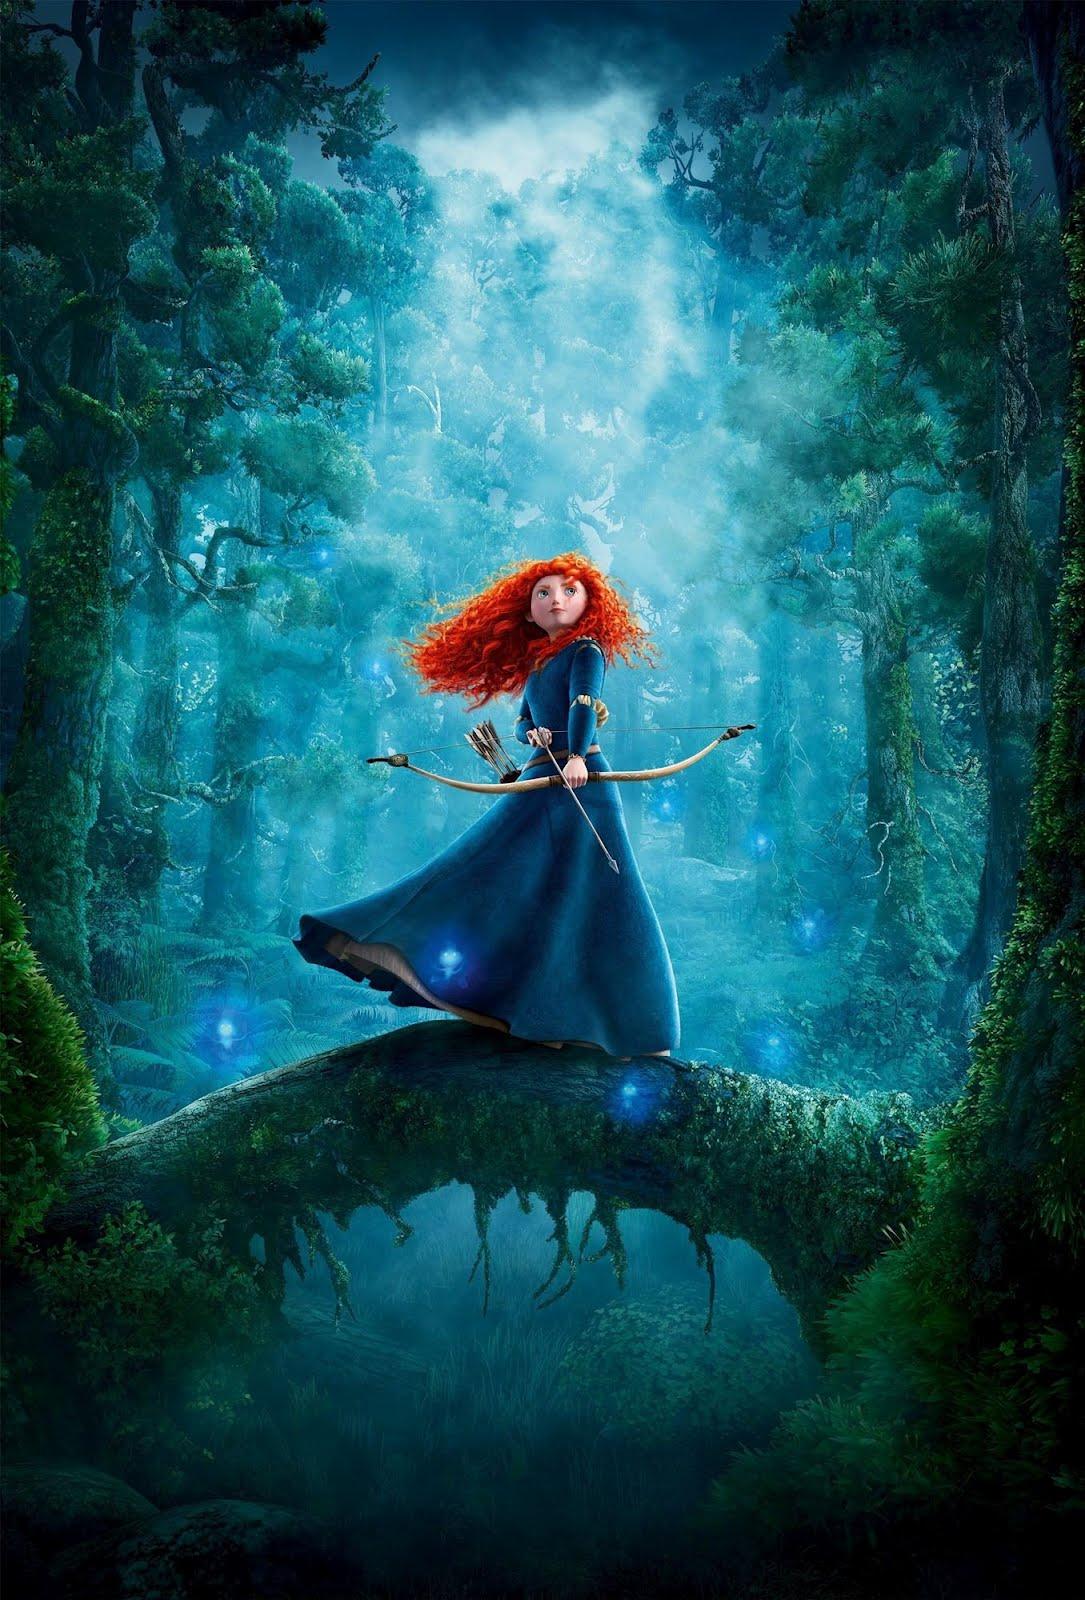 http://3.bp.blogspot.com/-z7spTiS4w2M/UCgjLQmHToI/AAAAAAAAAhU/txr1Q0S3oEI/s1600/brave-indomable-valiente-disney-pixar-princesa-merida-princess-pelicula-movie-poster-cartel-japon-japan-japanese-critica-rese%25C3%25B1a%2B%25282%2529.jpg